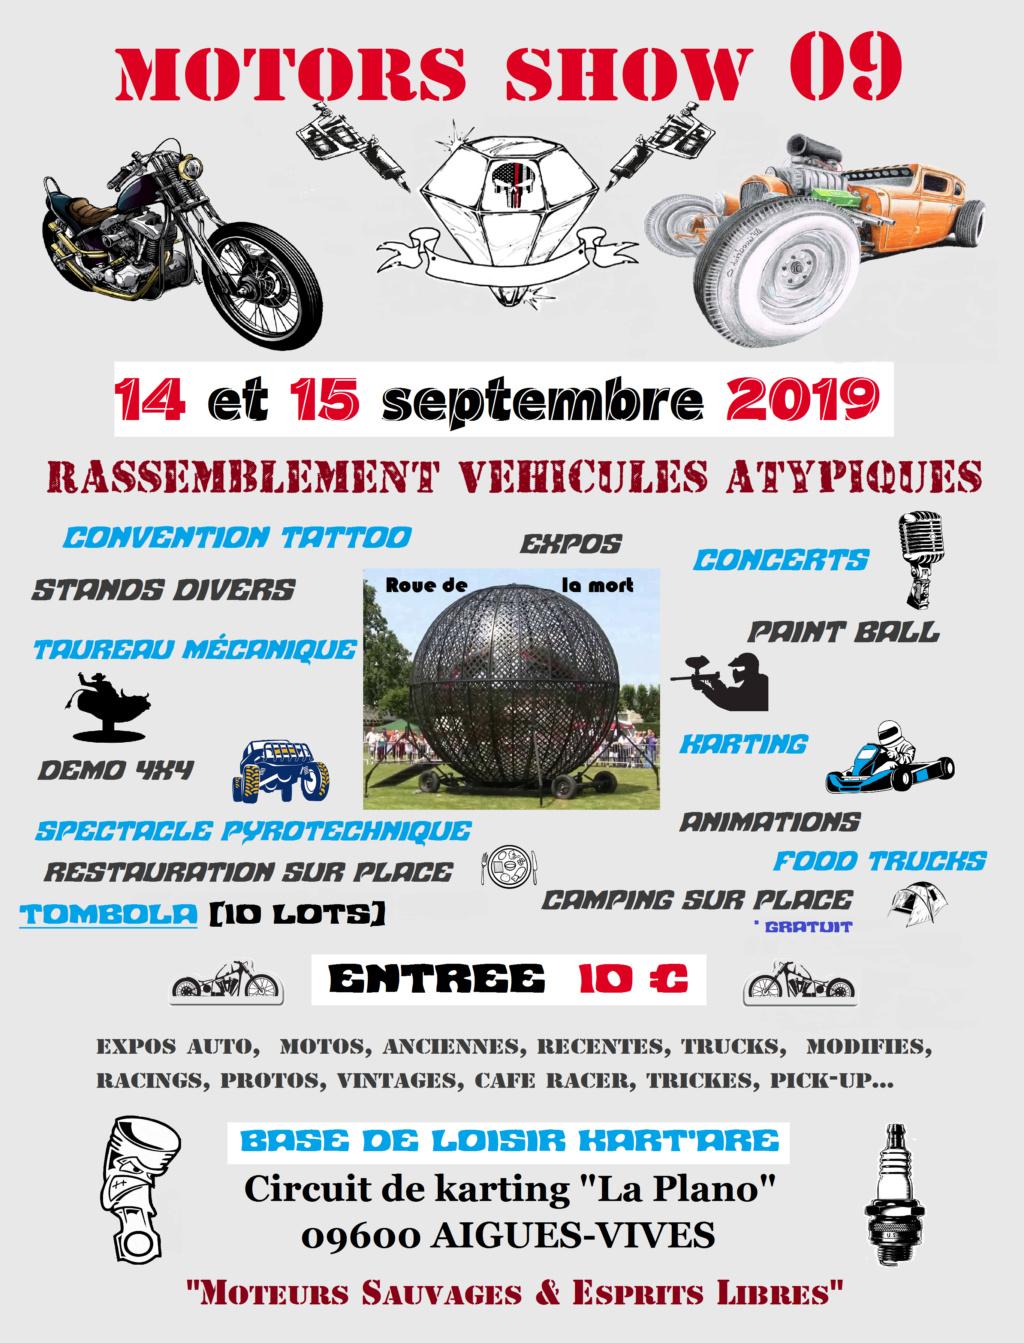 MANIFESTATION - Motors Show 09  - 14 & 15 Septembre 2019 - Aigues - Vives -(09600)  2019af10